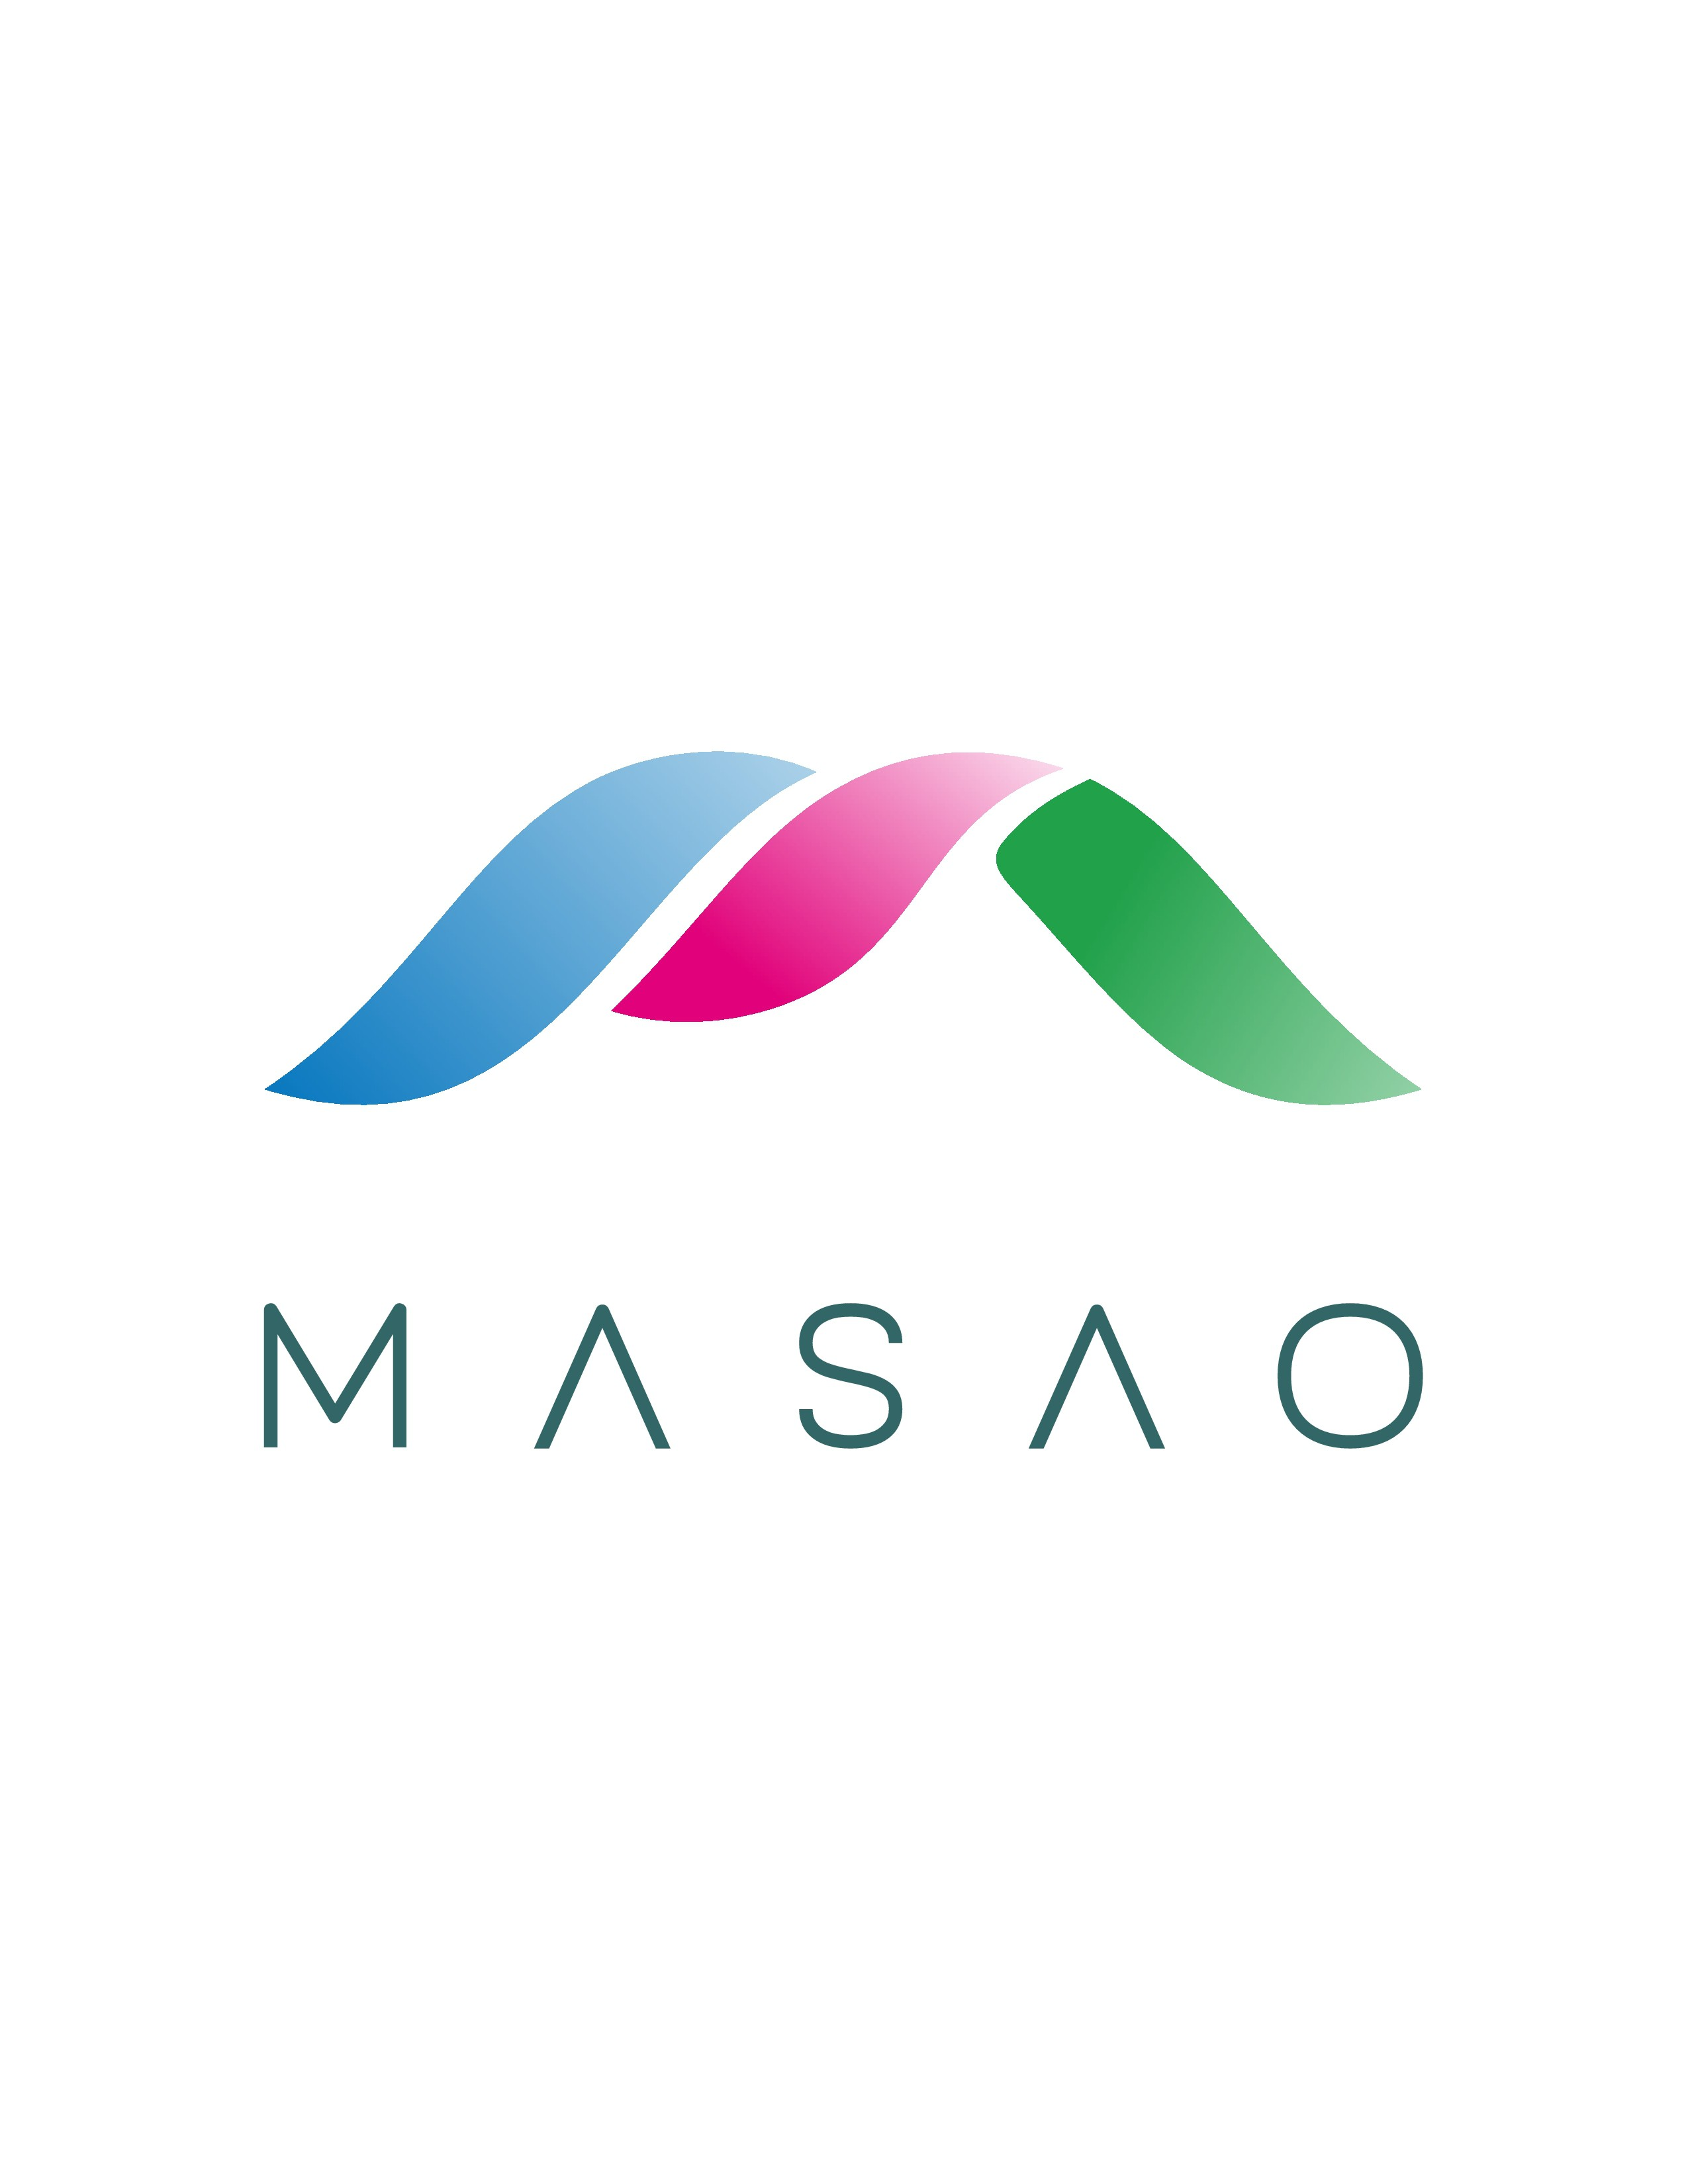 Imagine the new MASAO logo